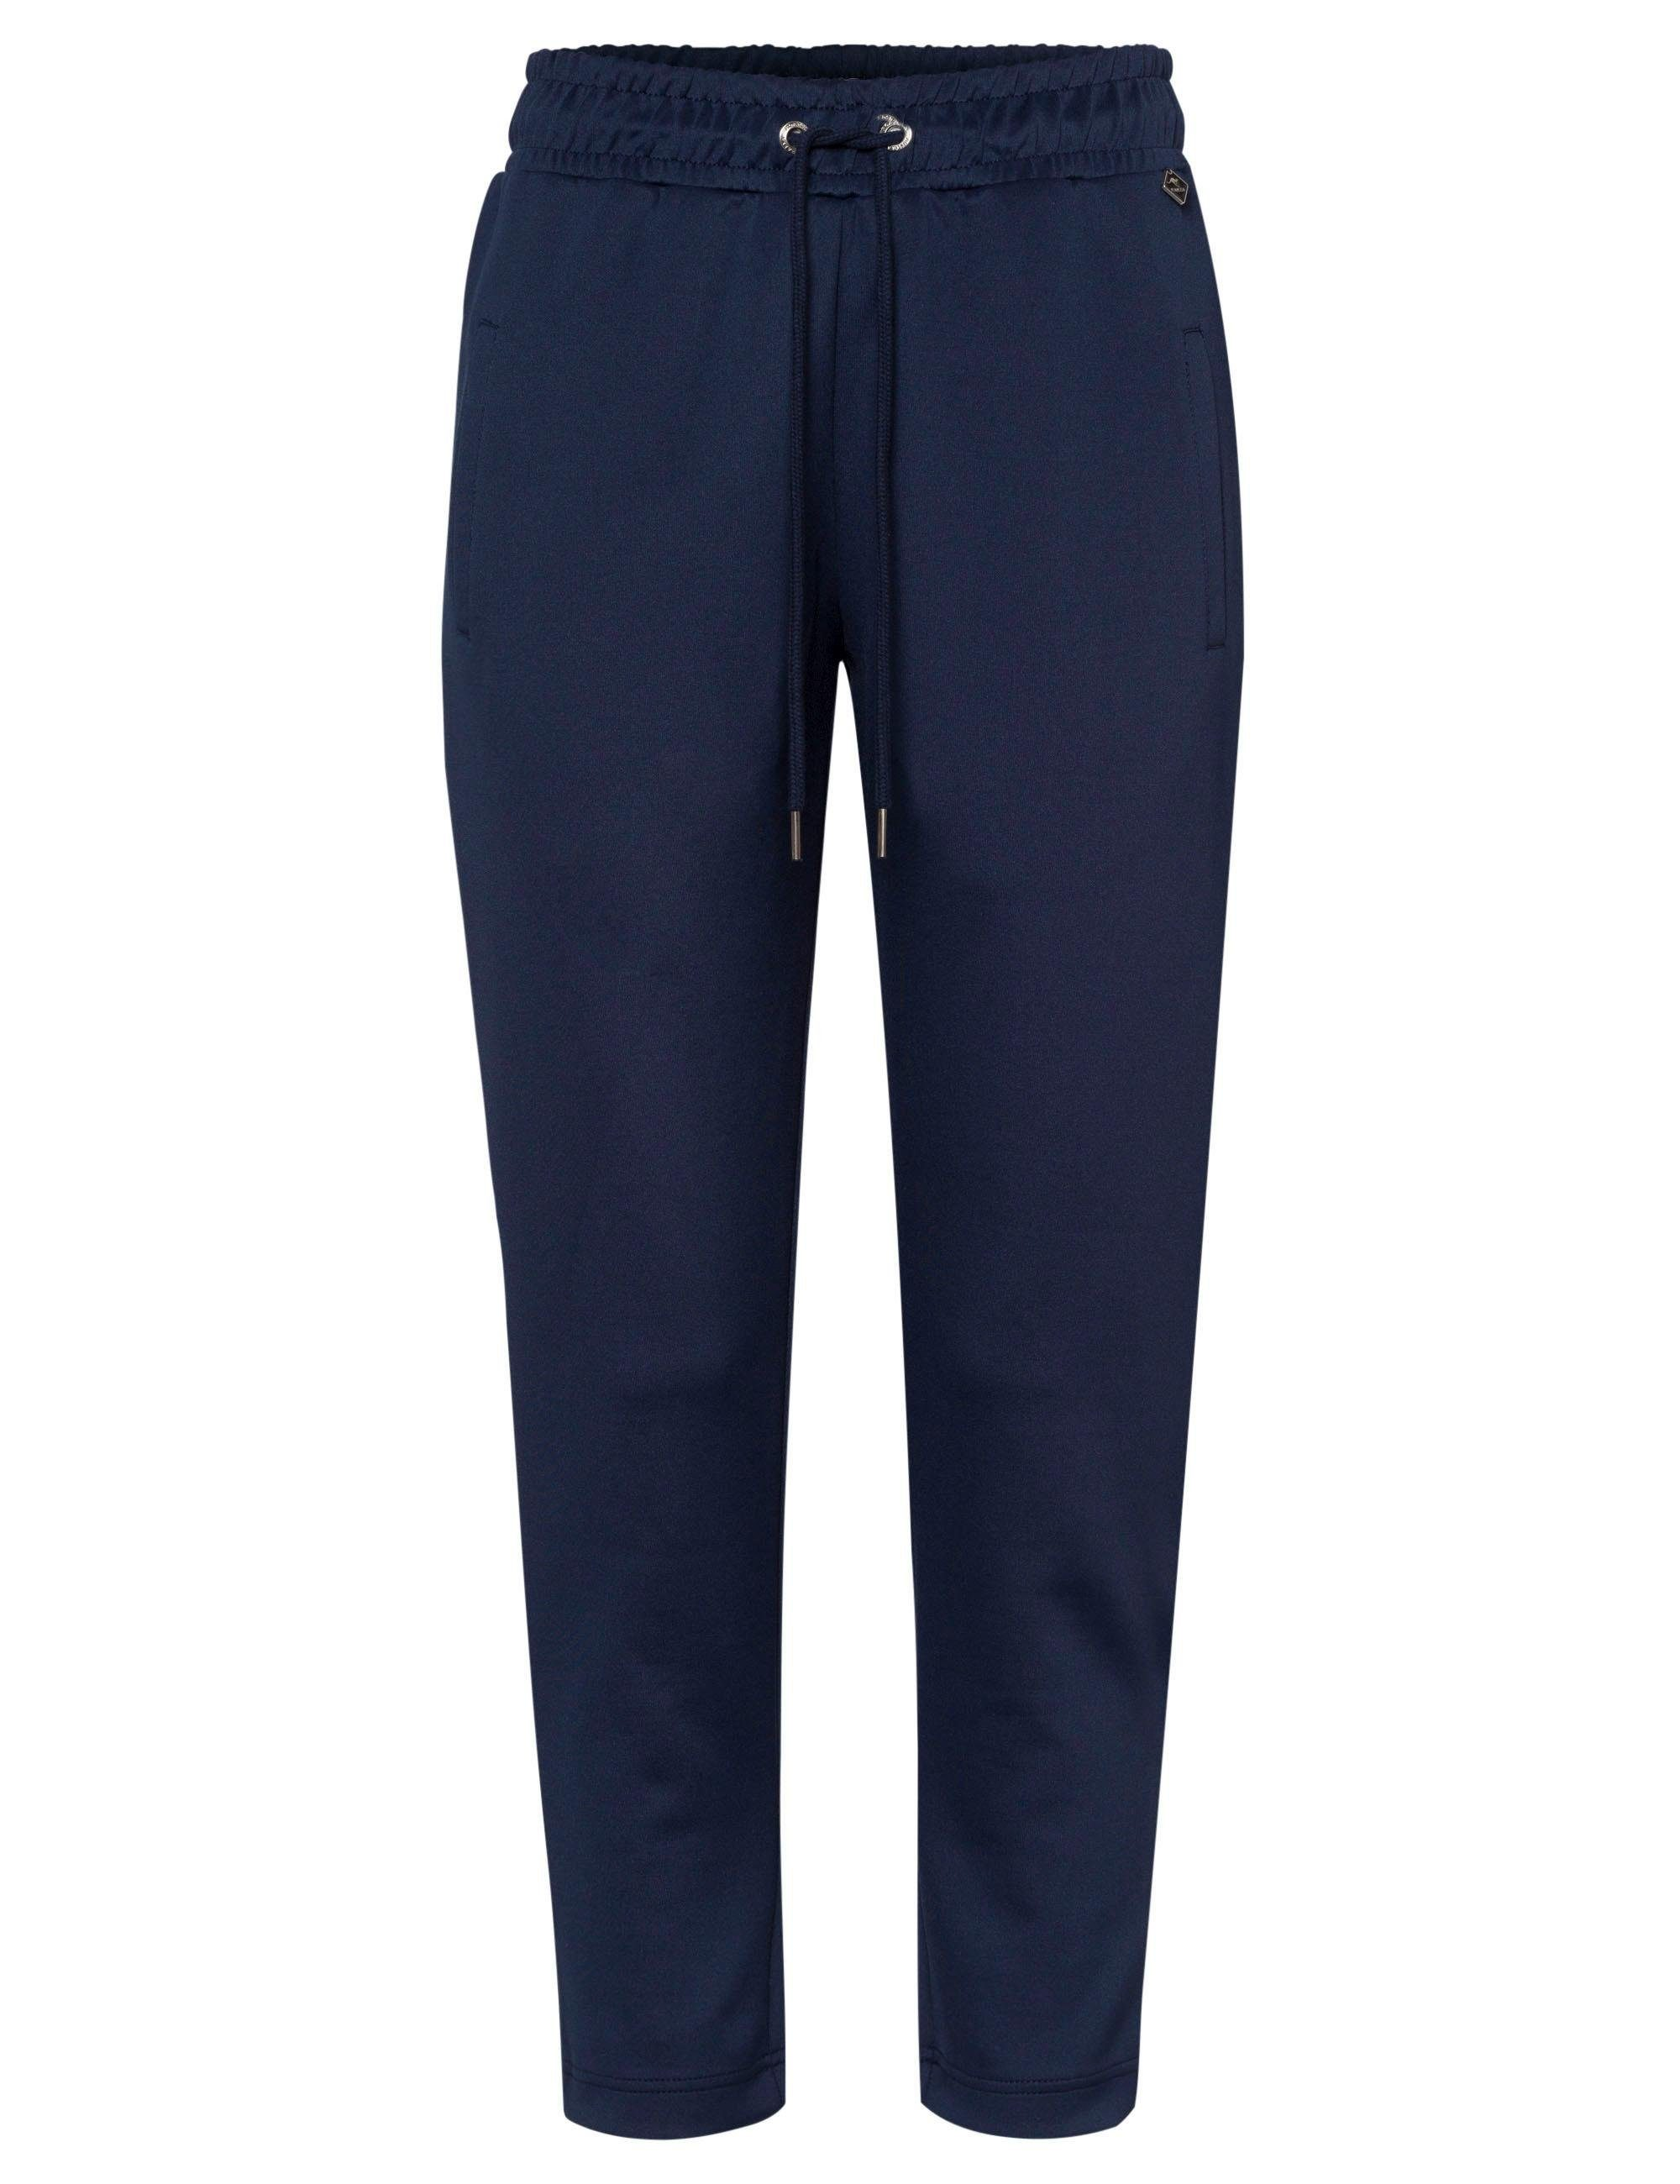 Australia Jogger Roadsign Kaufen Online Pants 45qARL3j